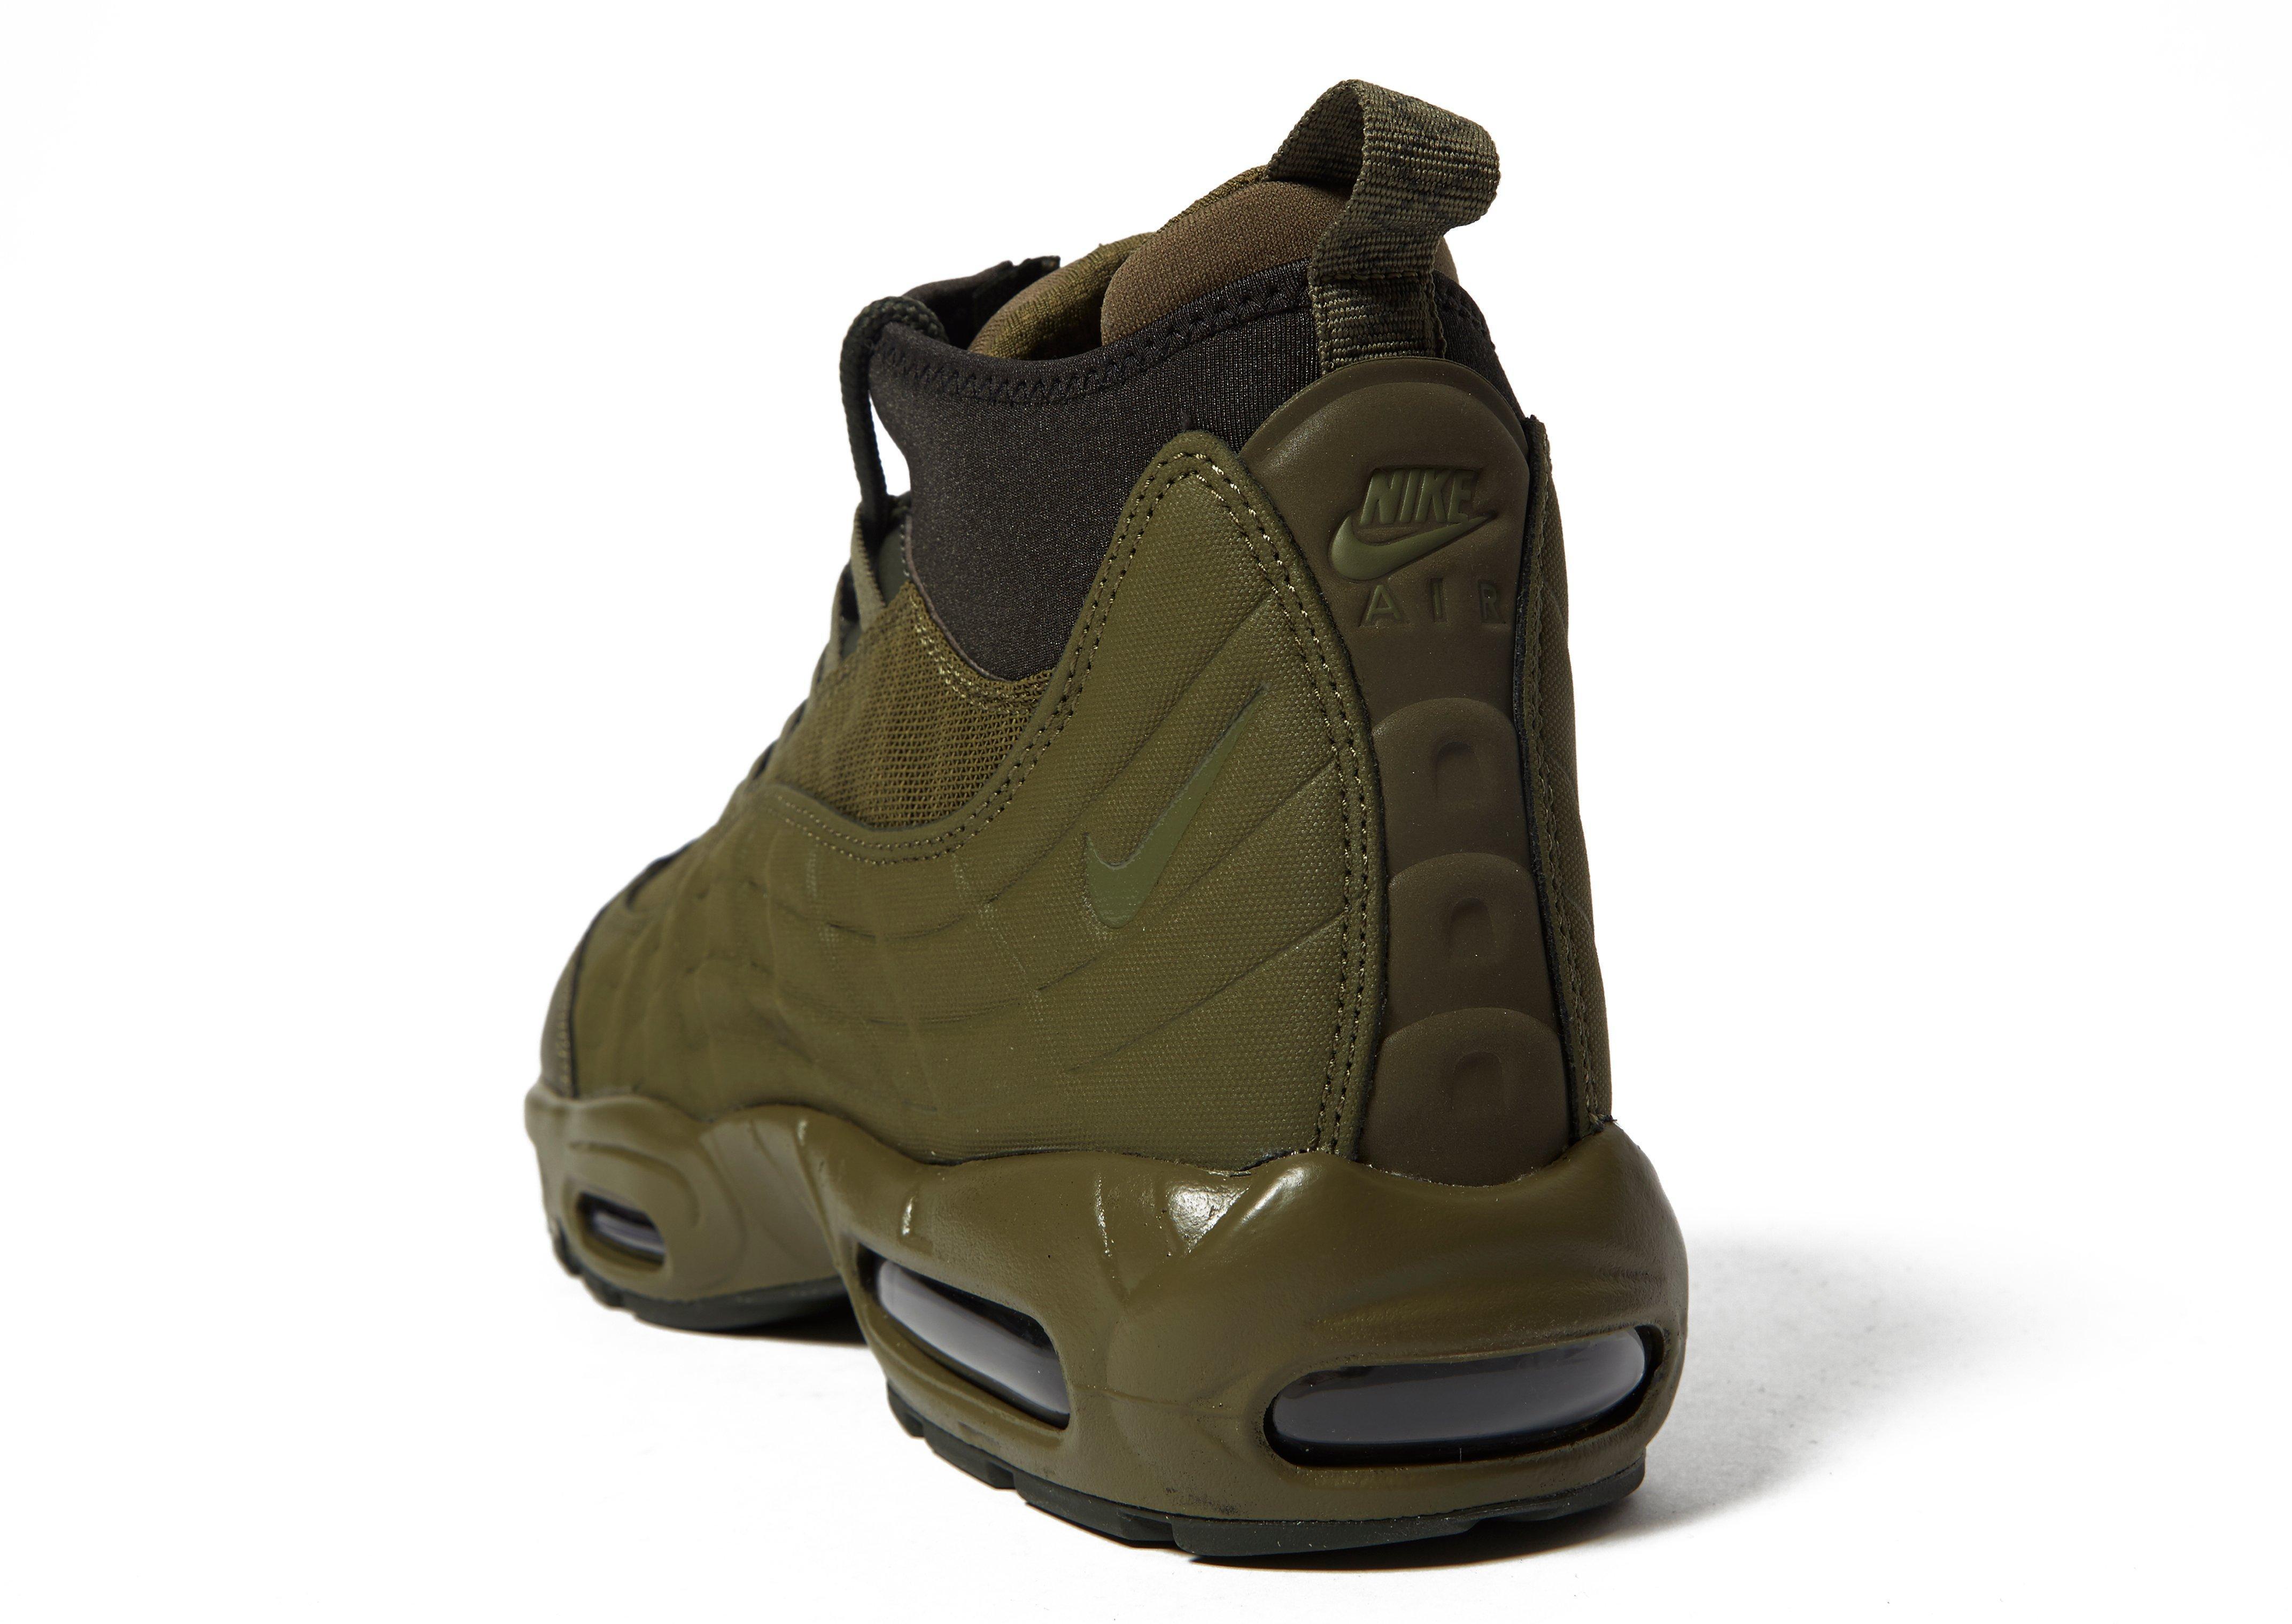 7e21808280 uk lyst nike air max 95 sneakerboot in green for men ac241 8f45b